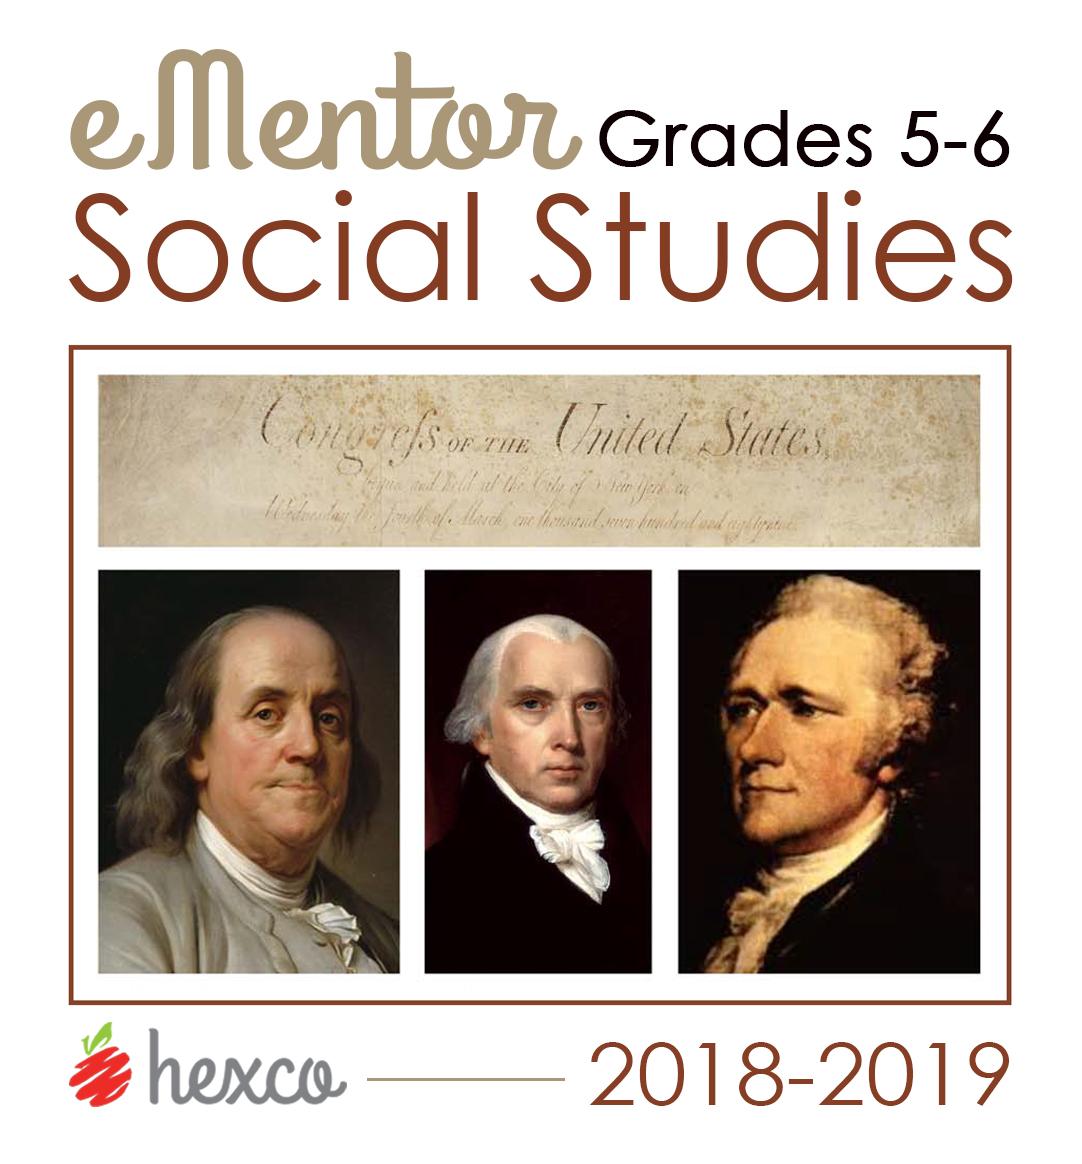 uil-social-studies-ementor-grades-5-6-a-psia.jpg